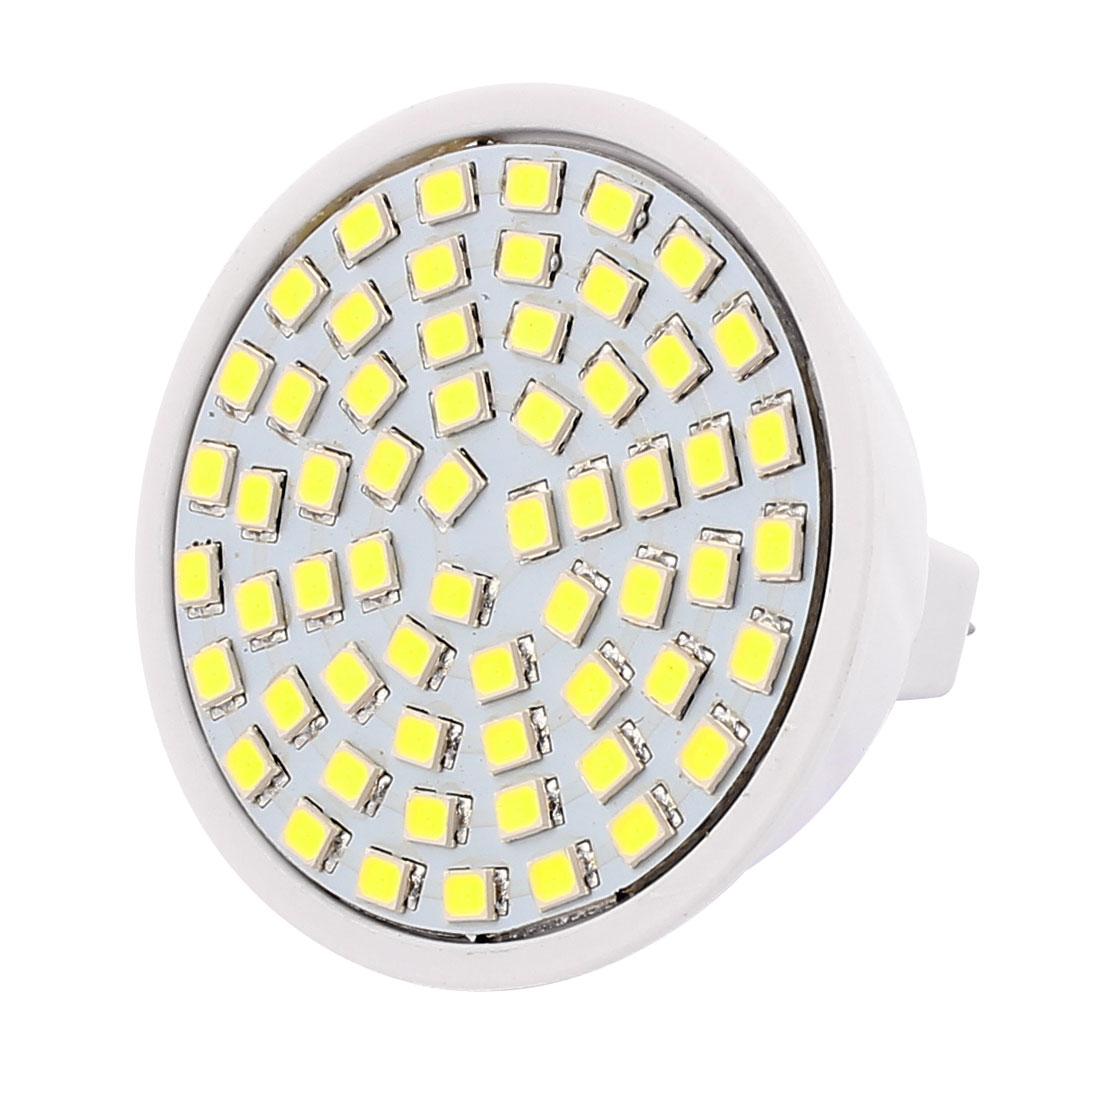 MR16 SMD 2835 60 LEDs 6W Plastic Energy-Saving LED Lamp Bulb White AC 110V